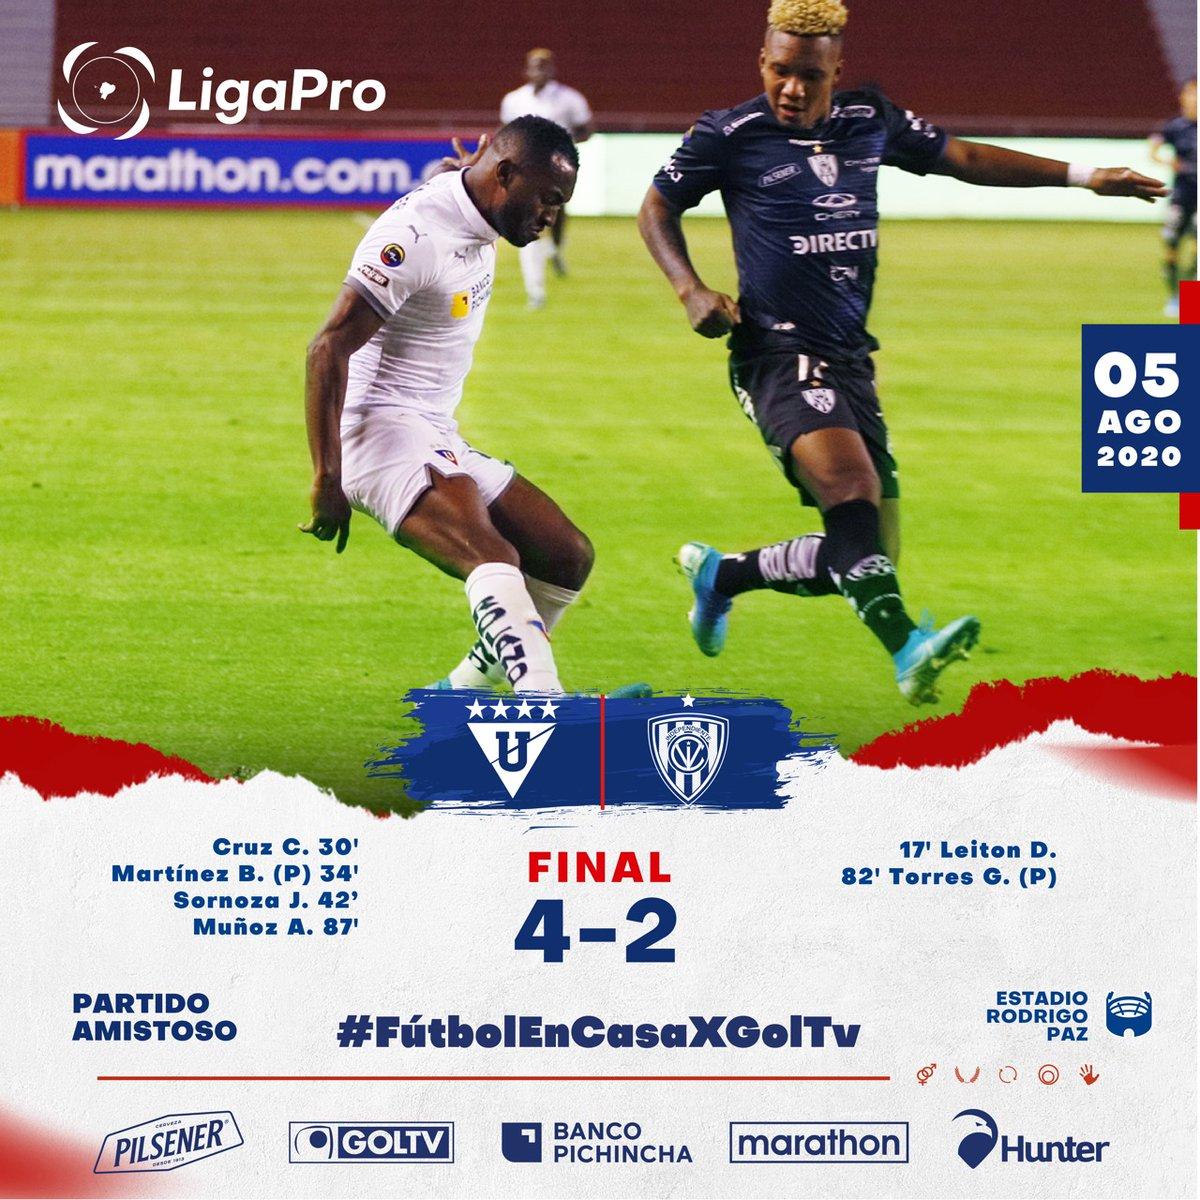 ¡Marcador Final!  #LigaPro   Amistoso ⠀   Estadio Rodrigo Paz Delgado ⠀ #LDU #IDV (-)⠀  Goles: #LDU: Cruz (30'), Martínez (34') -P, Sornoza (42'), Muñoz (87') #IDV: Leiton (17'), Torres (81') - P ⠀  #LigaPro  #GanamosTodos #LDU #IDVpic.twitter.com/9owauXuyuD